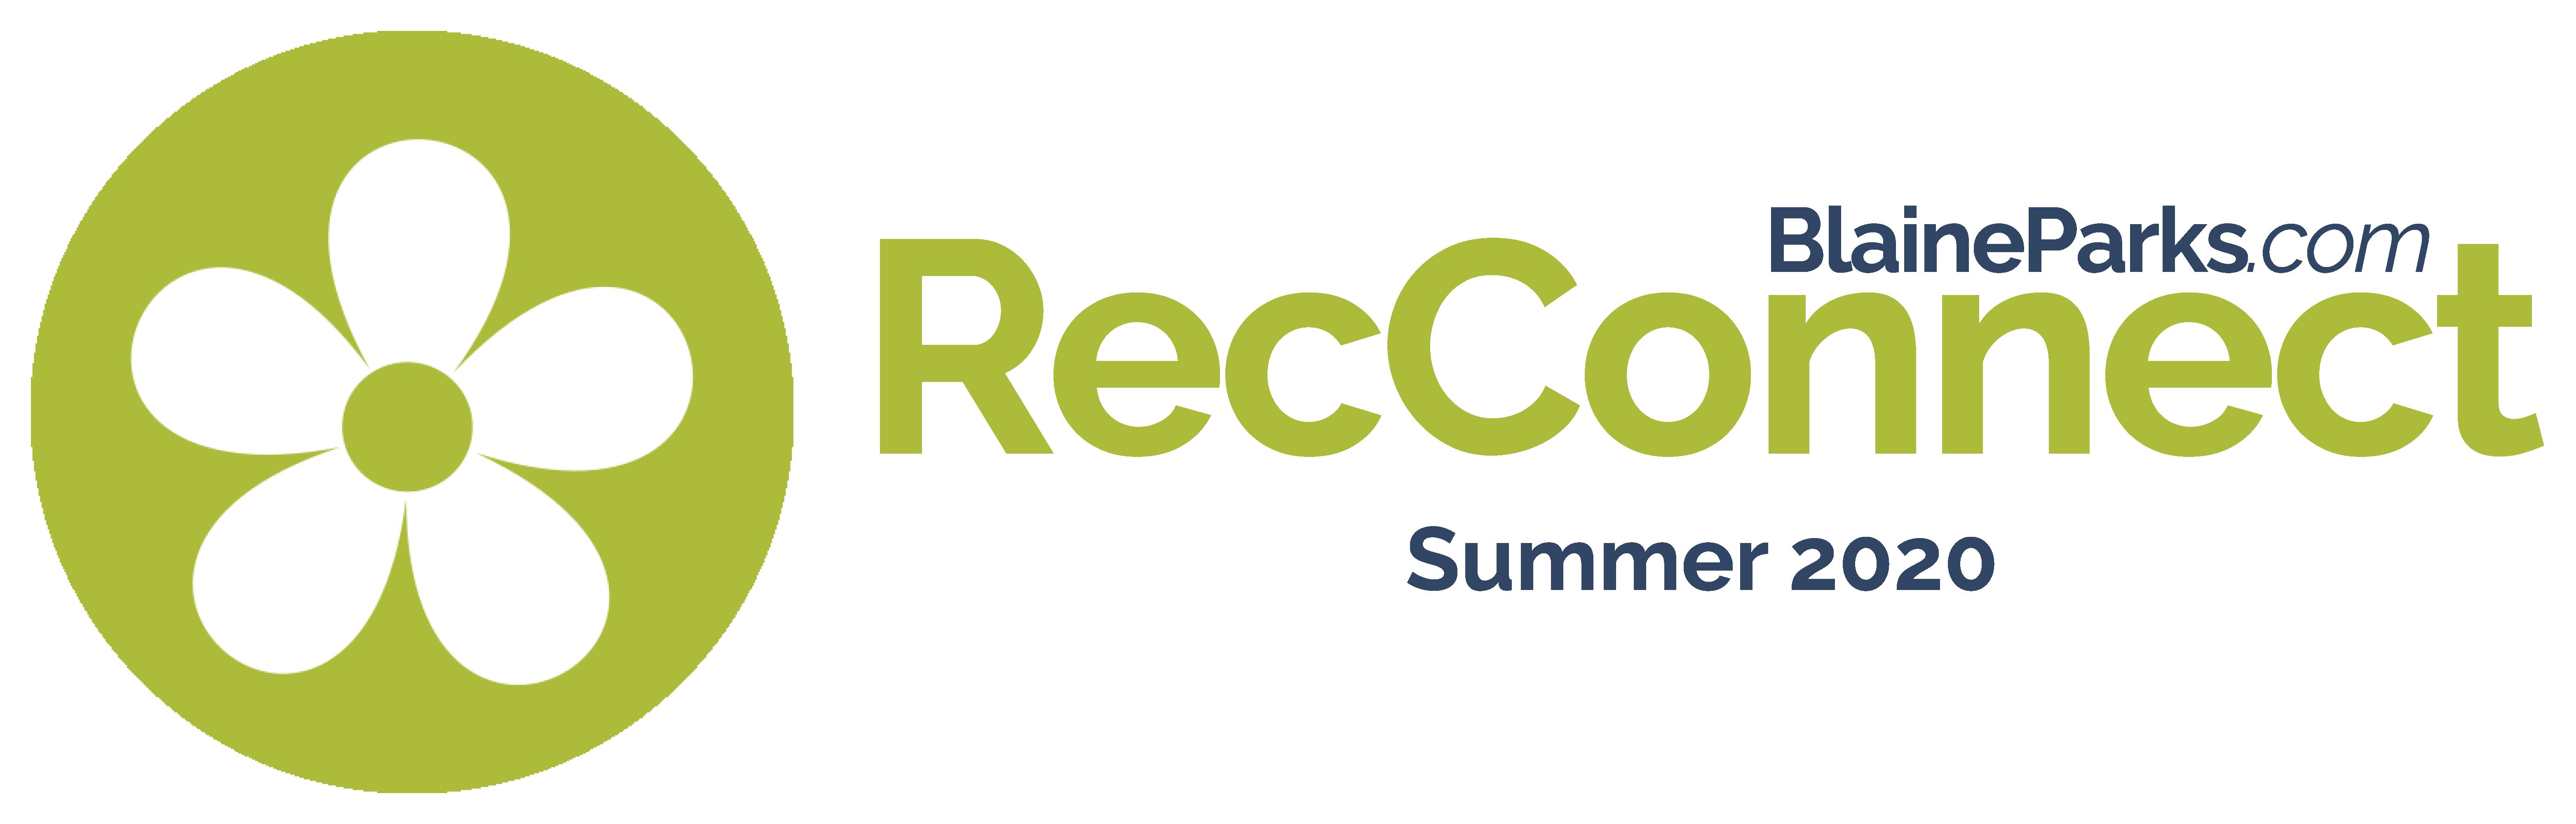 2020 Summer Banner 250x80 Activenet